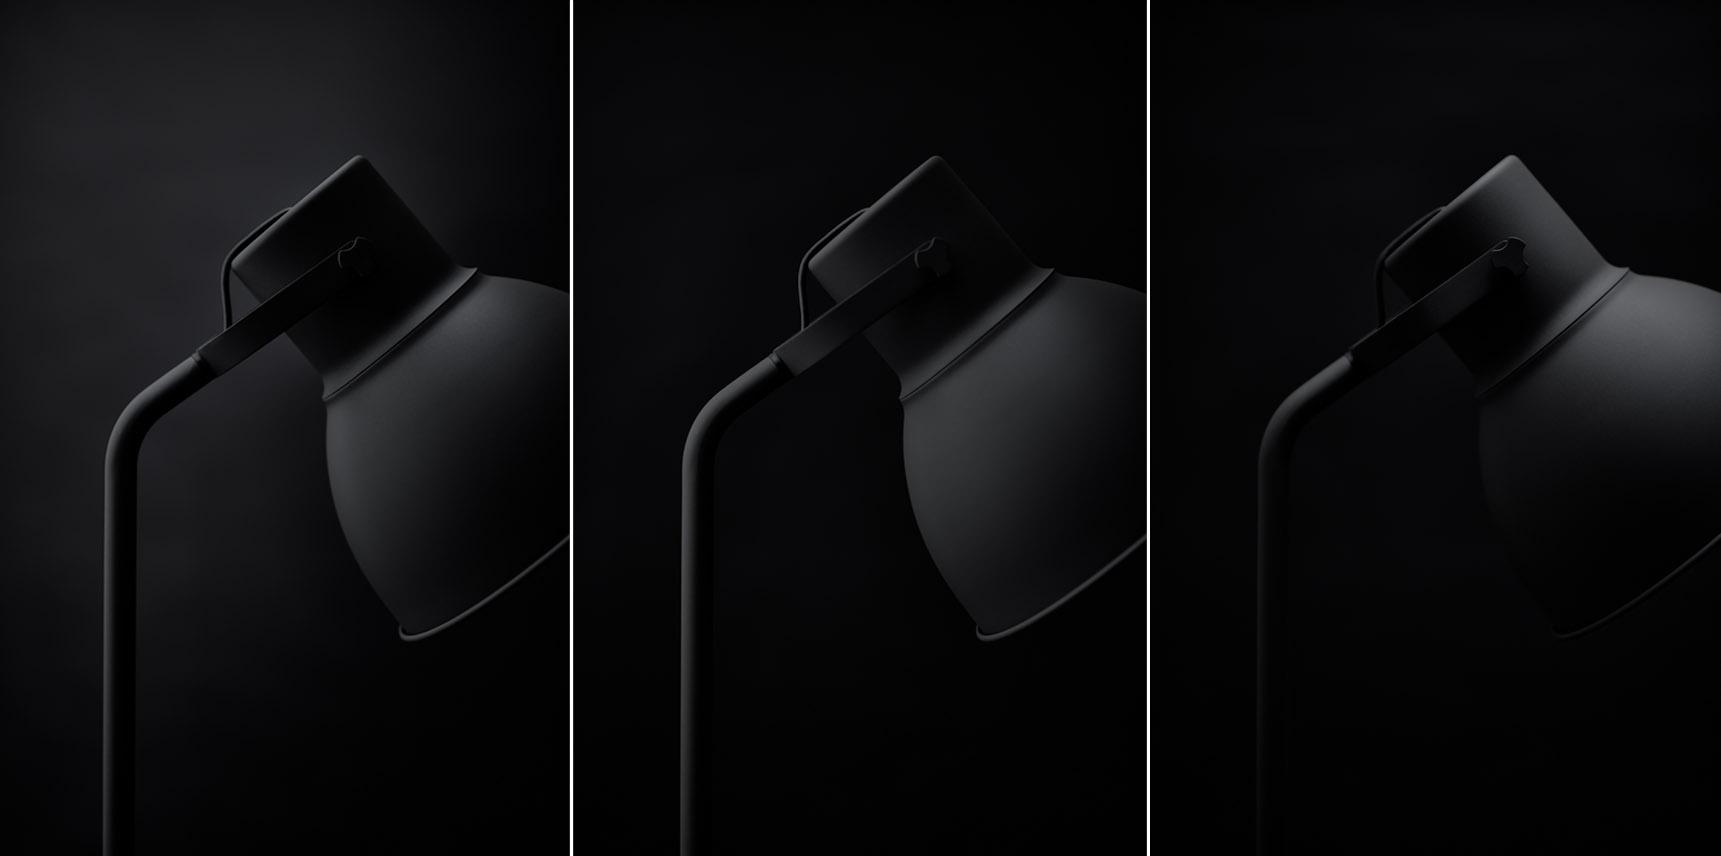 Dark grey lamps studio still life on a black background